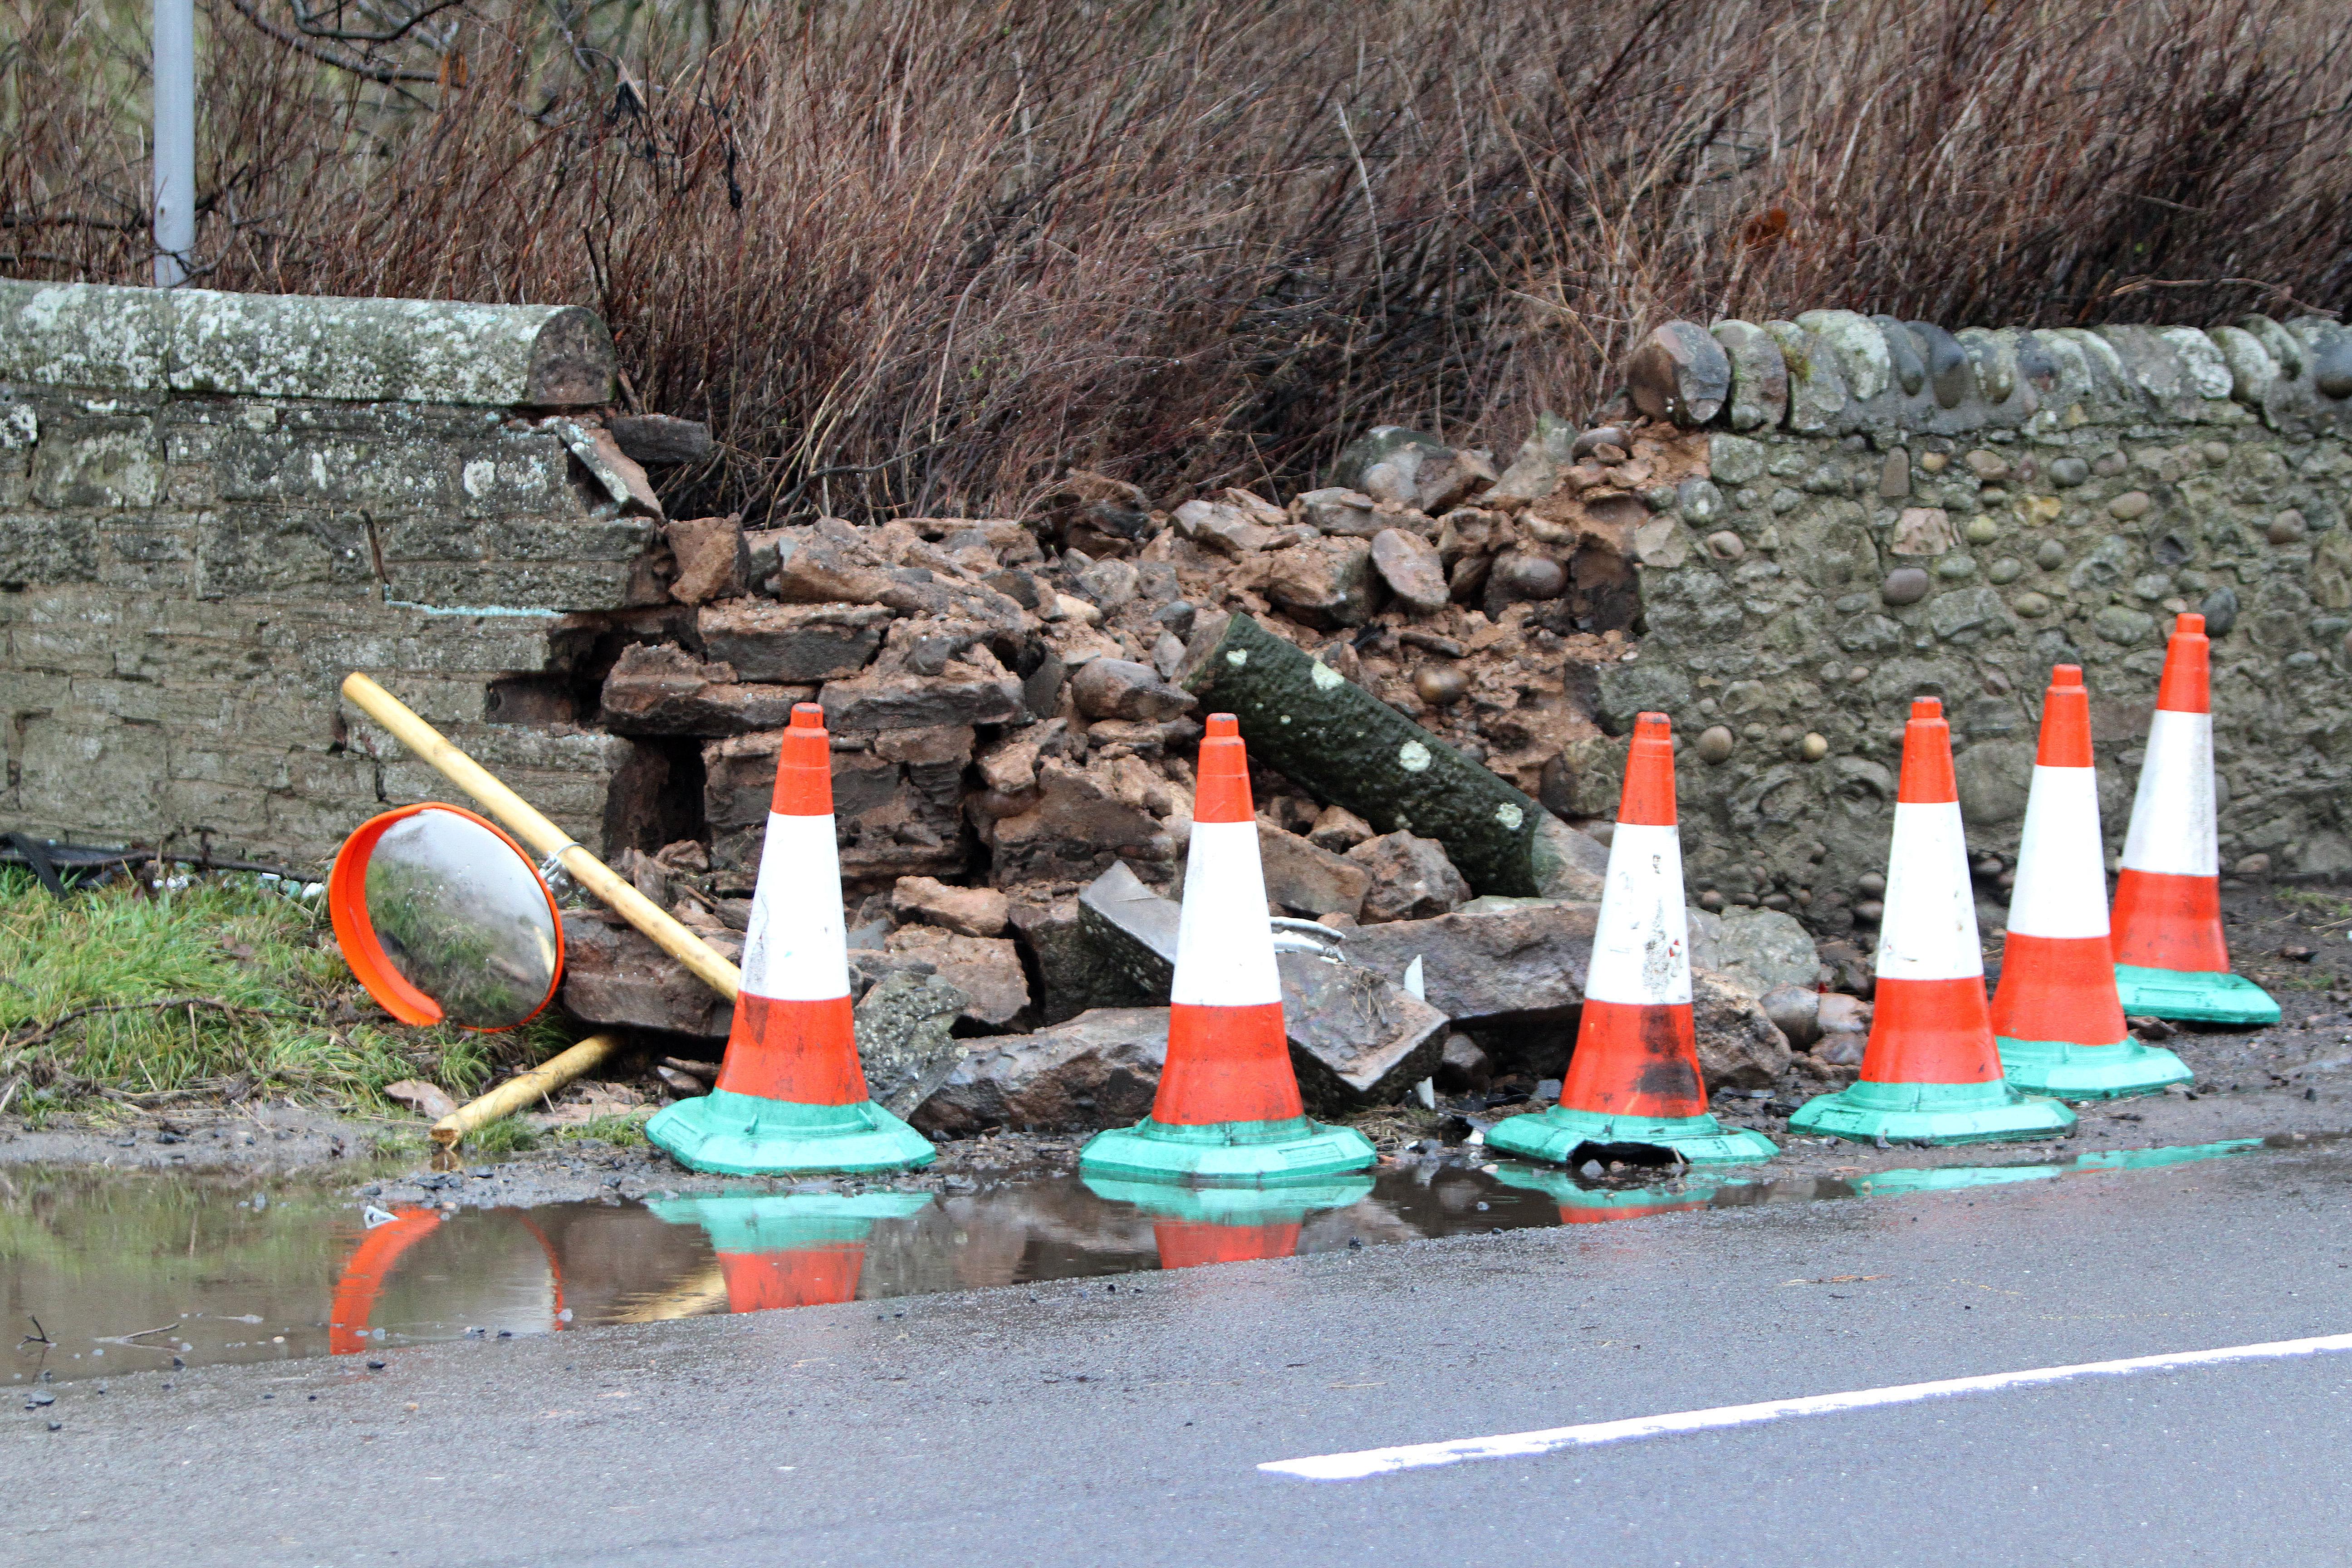 The crash scene near Panbride House.